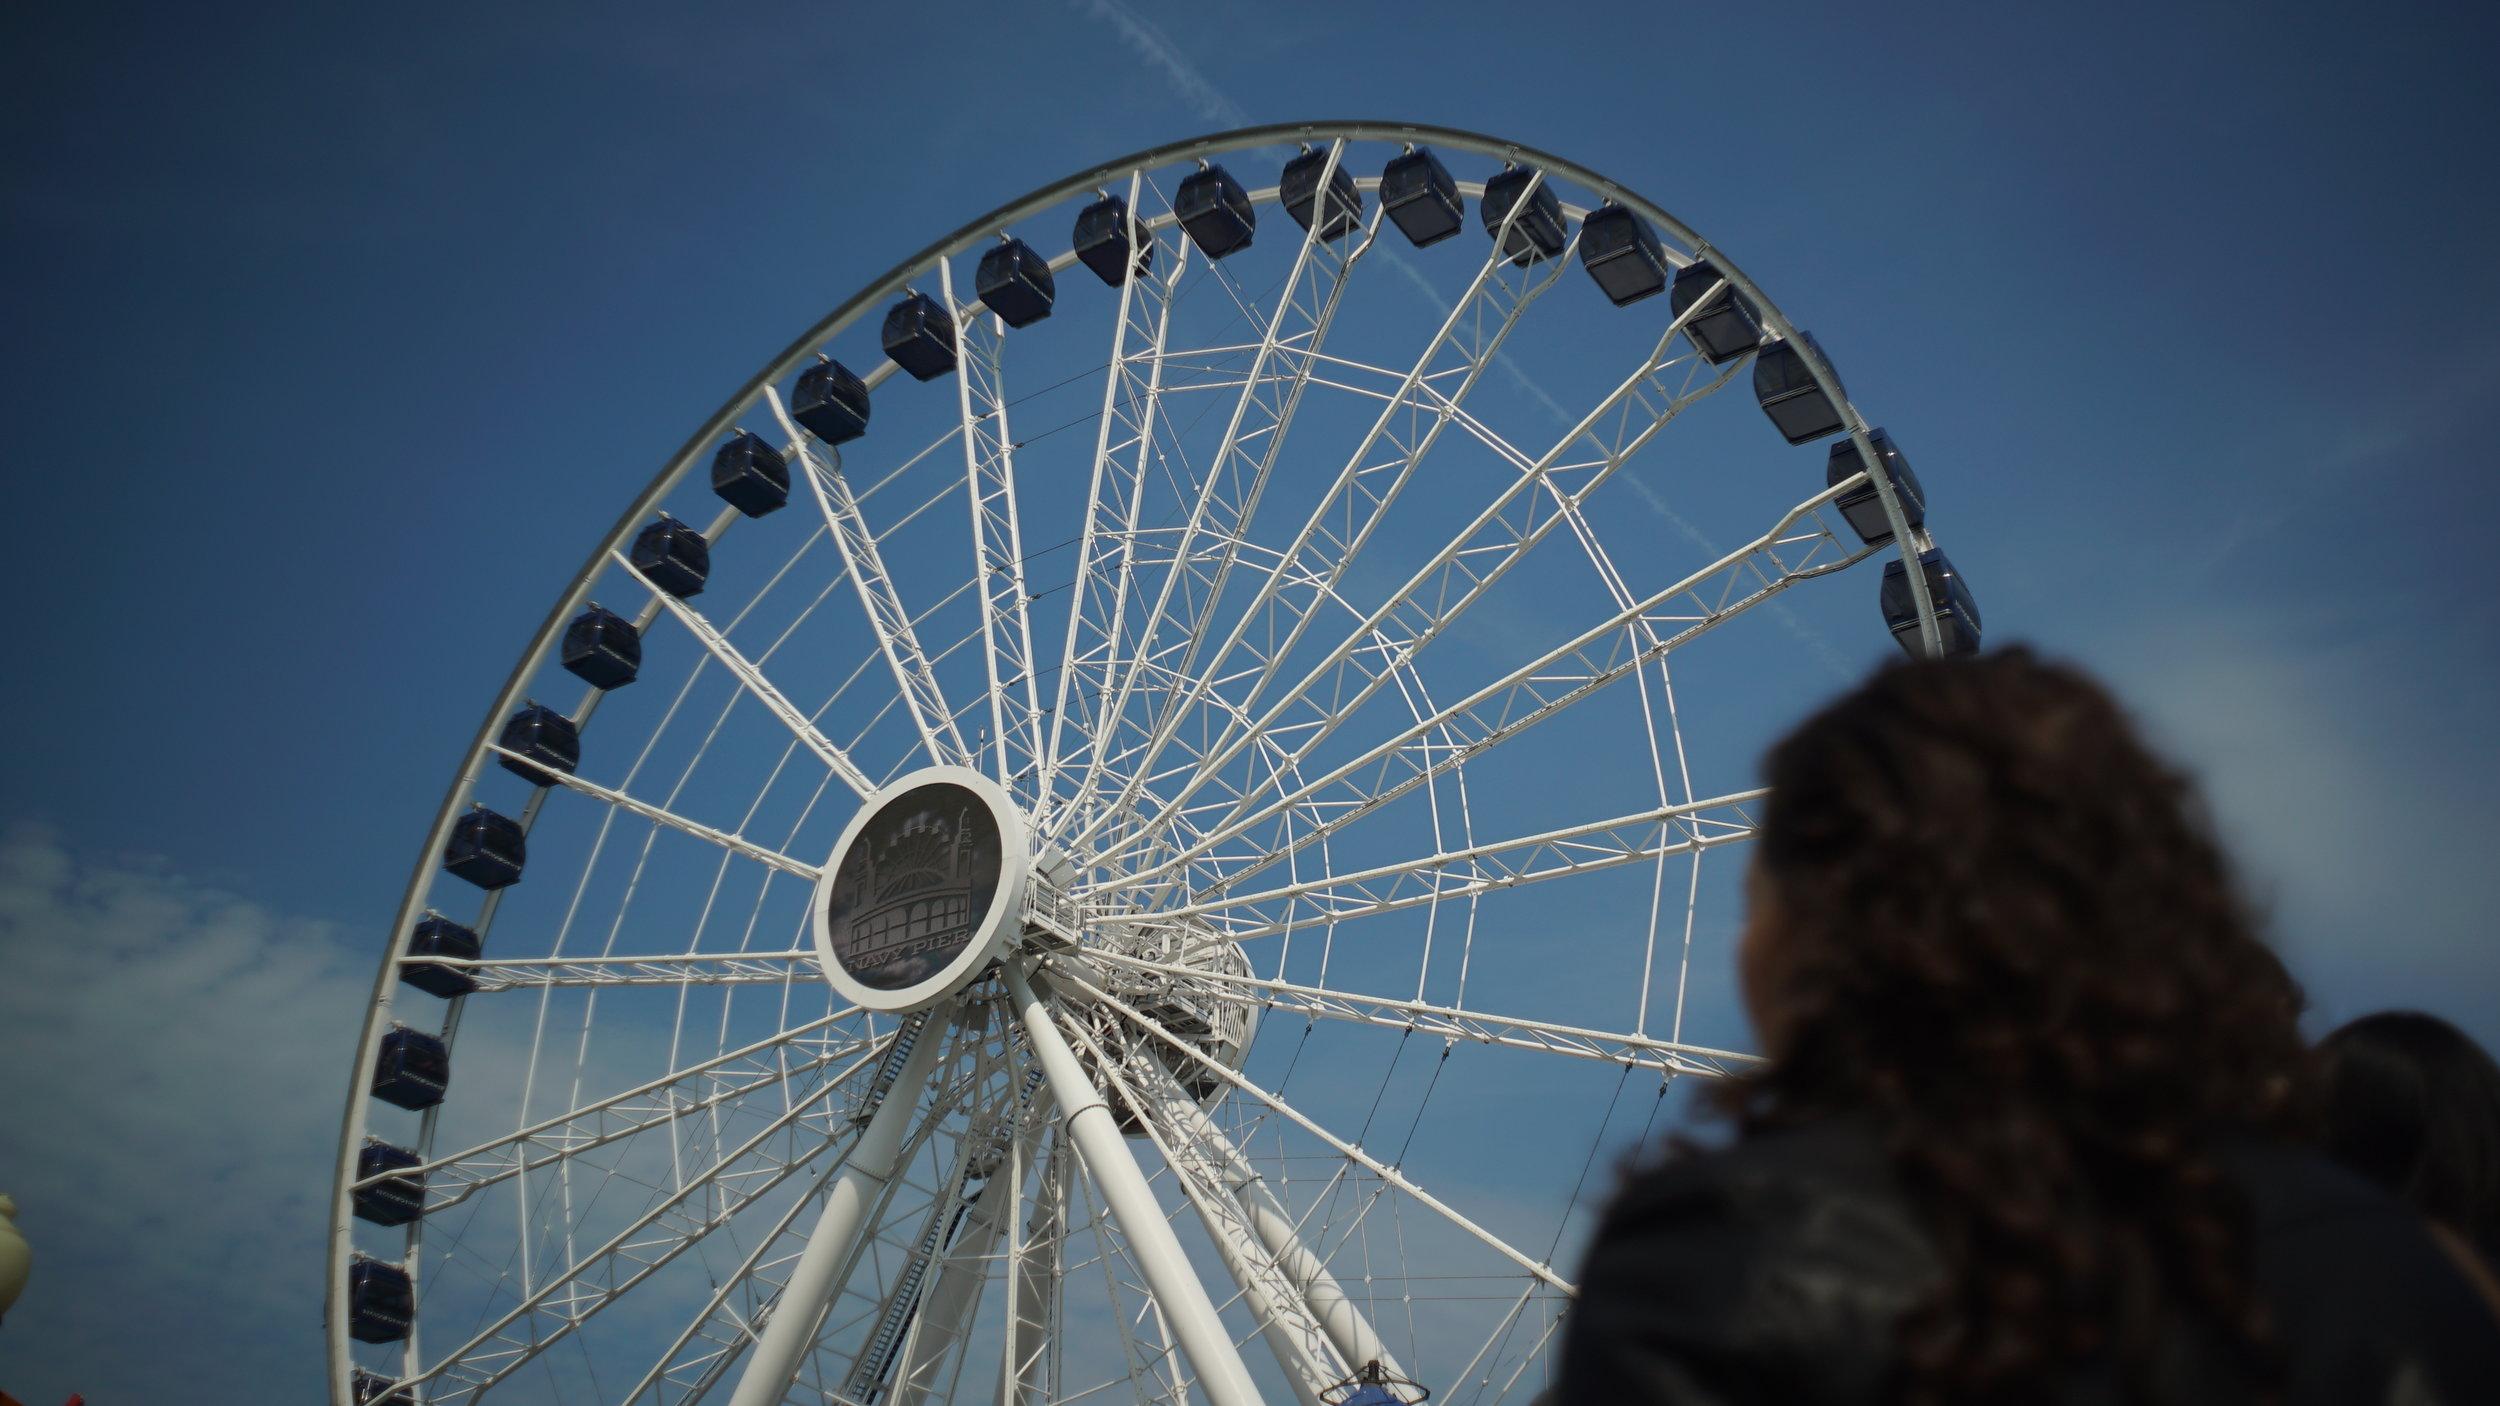 Navy Pier | Ferris Wheel